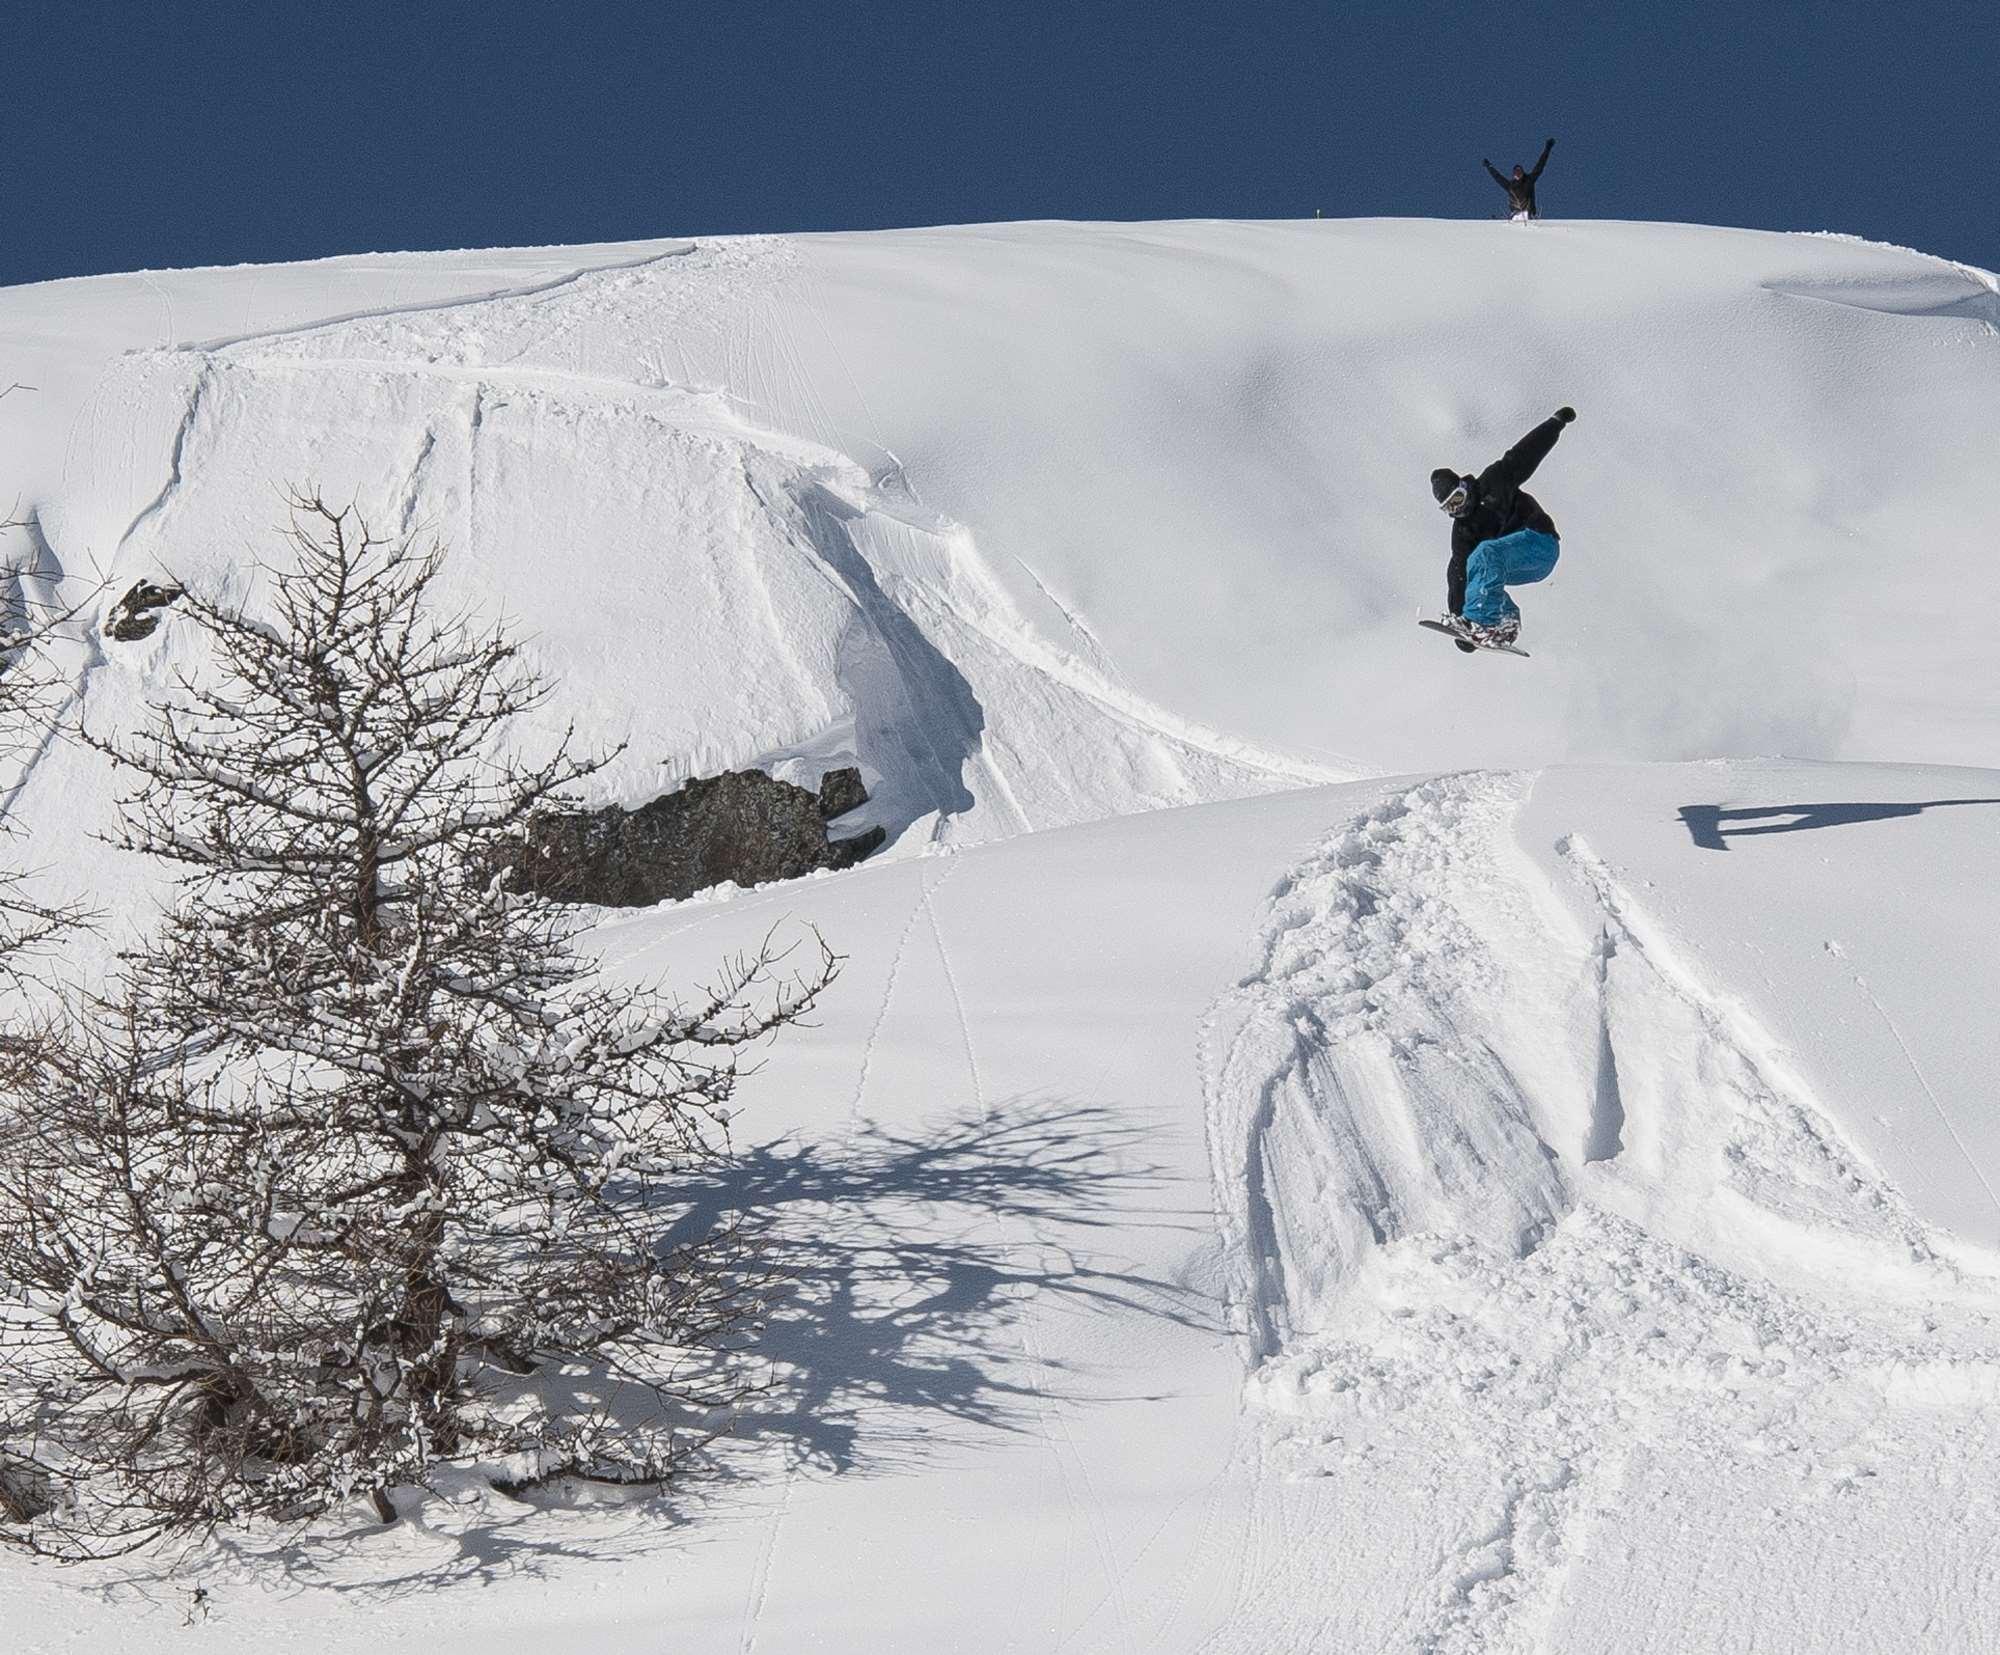 Snowboarding in Serre Chevalier